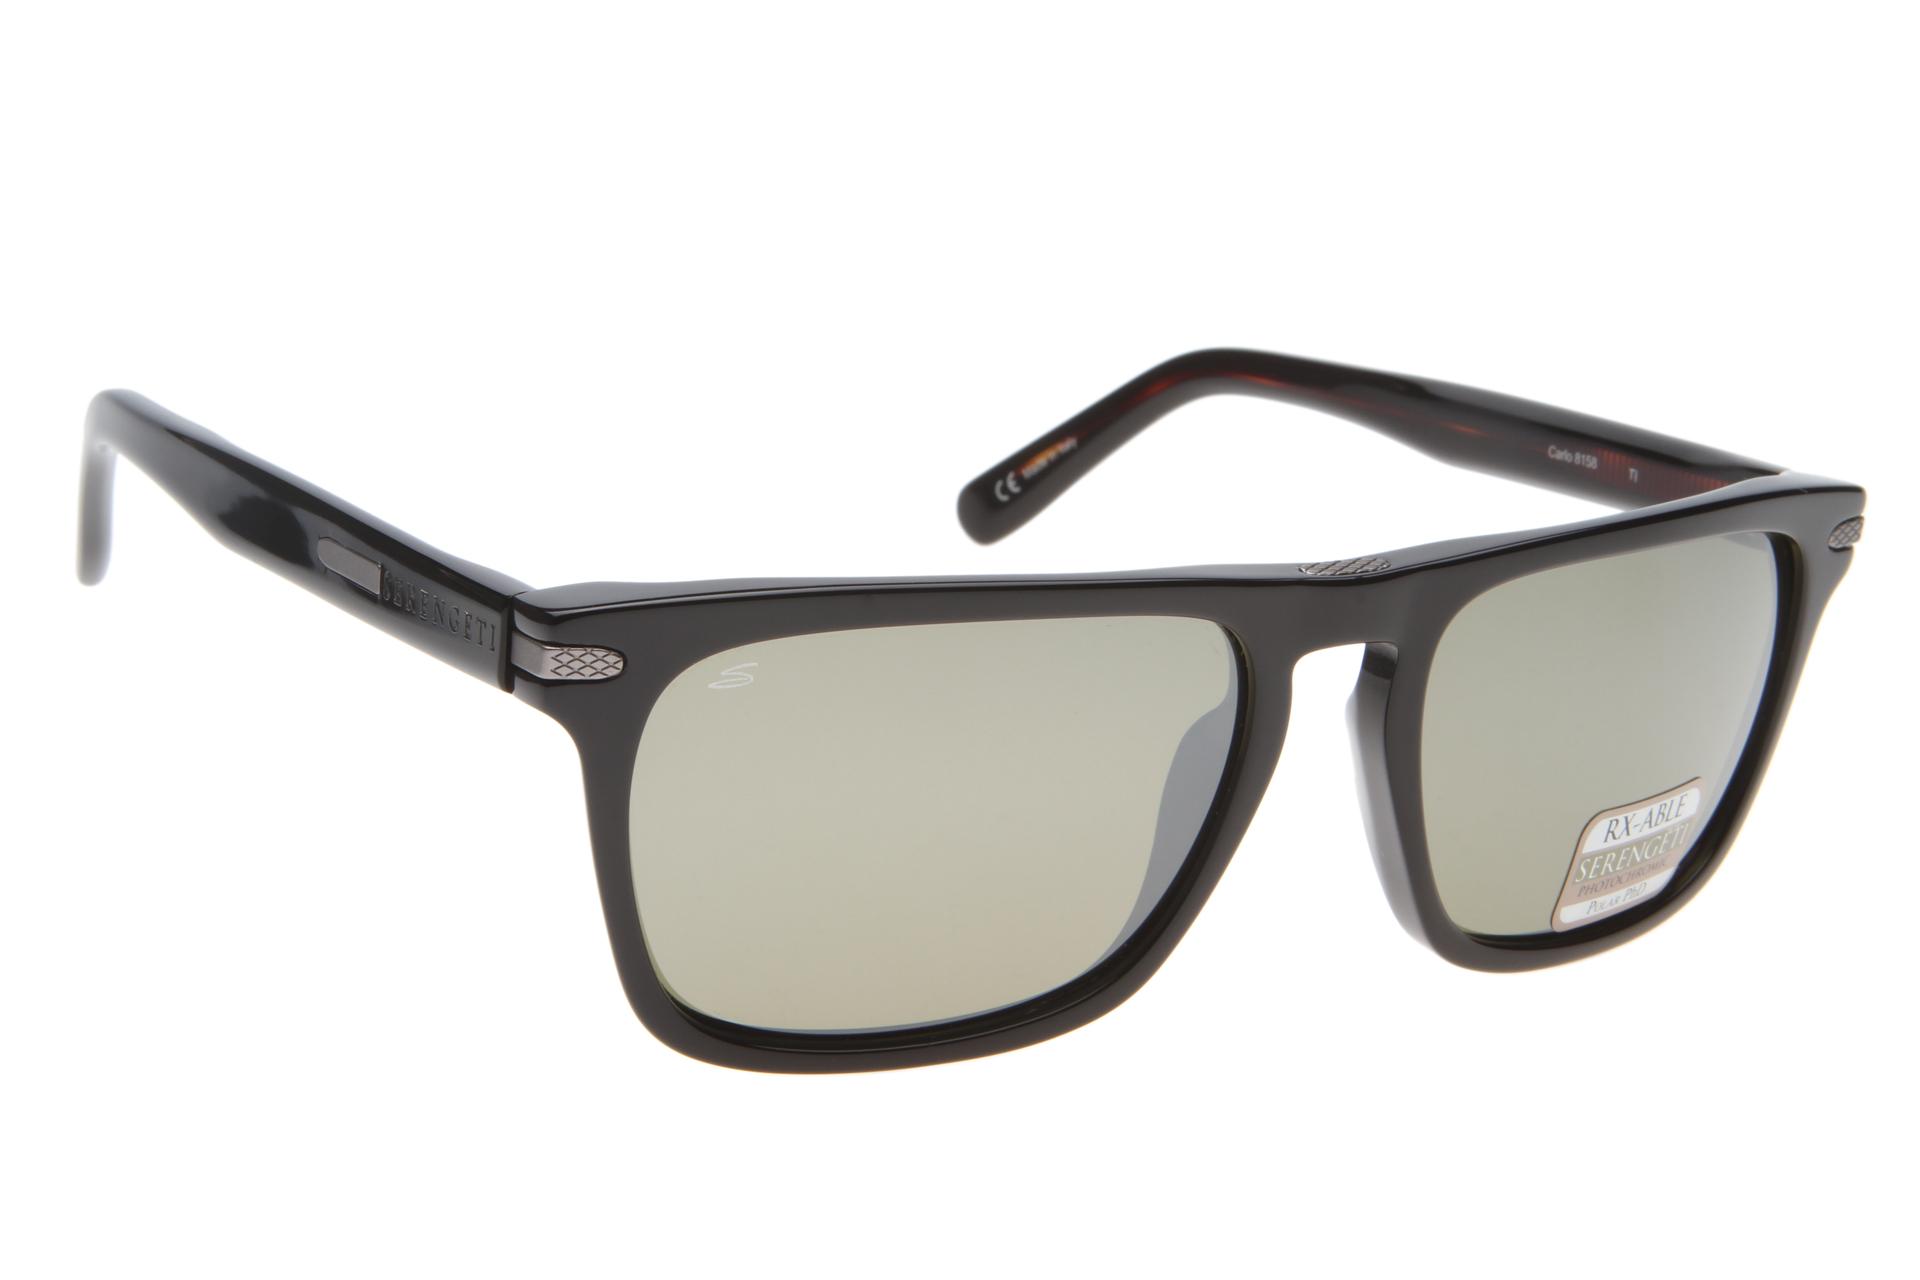 92397bfcf4b Serengeti Carlo 8158 (Shiny Black) Gepolariseerd zonnebril